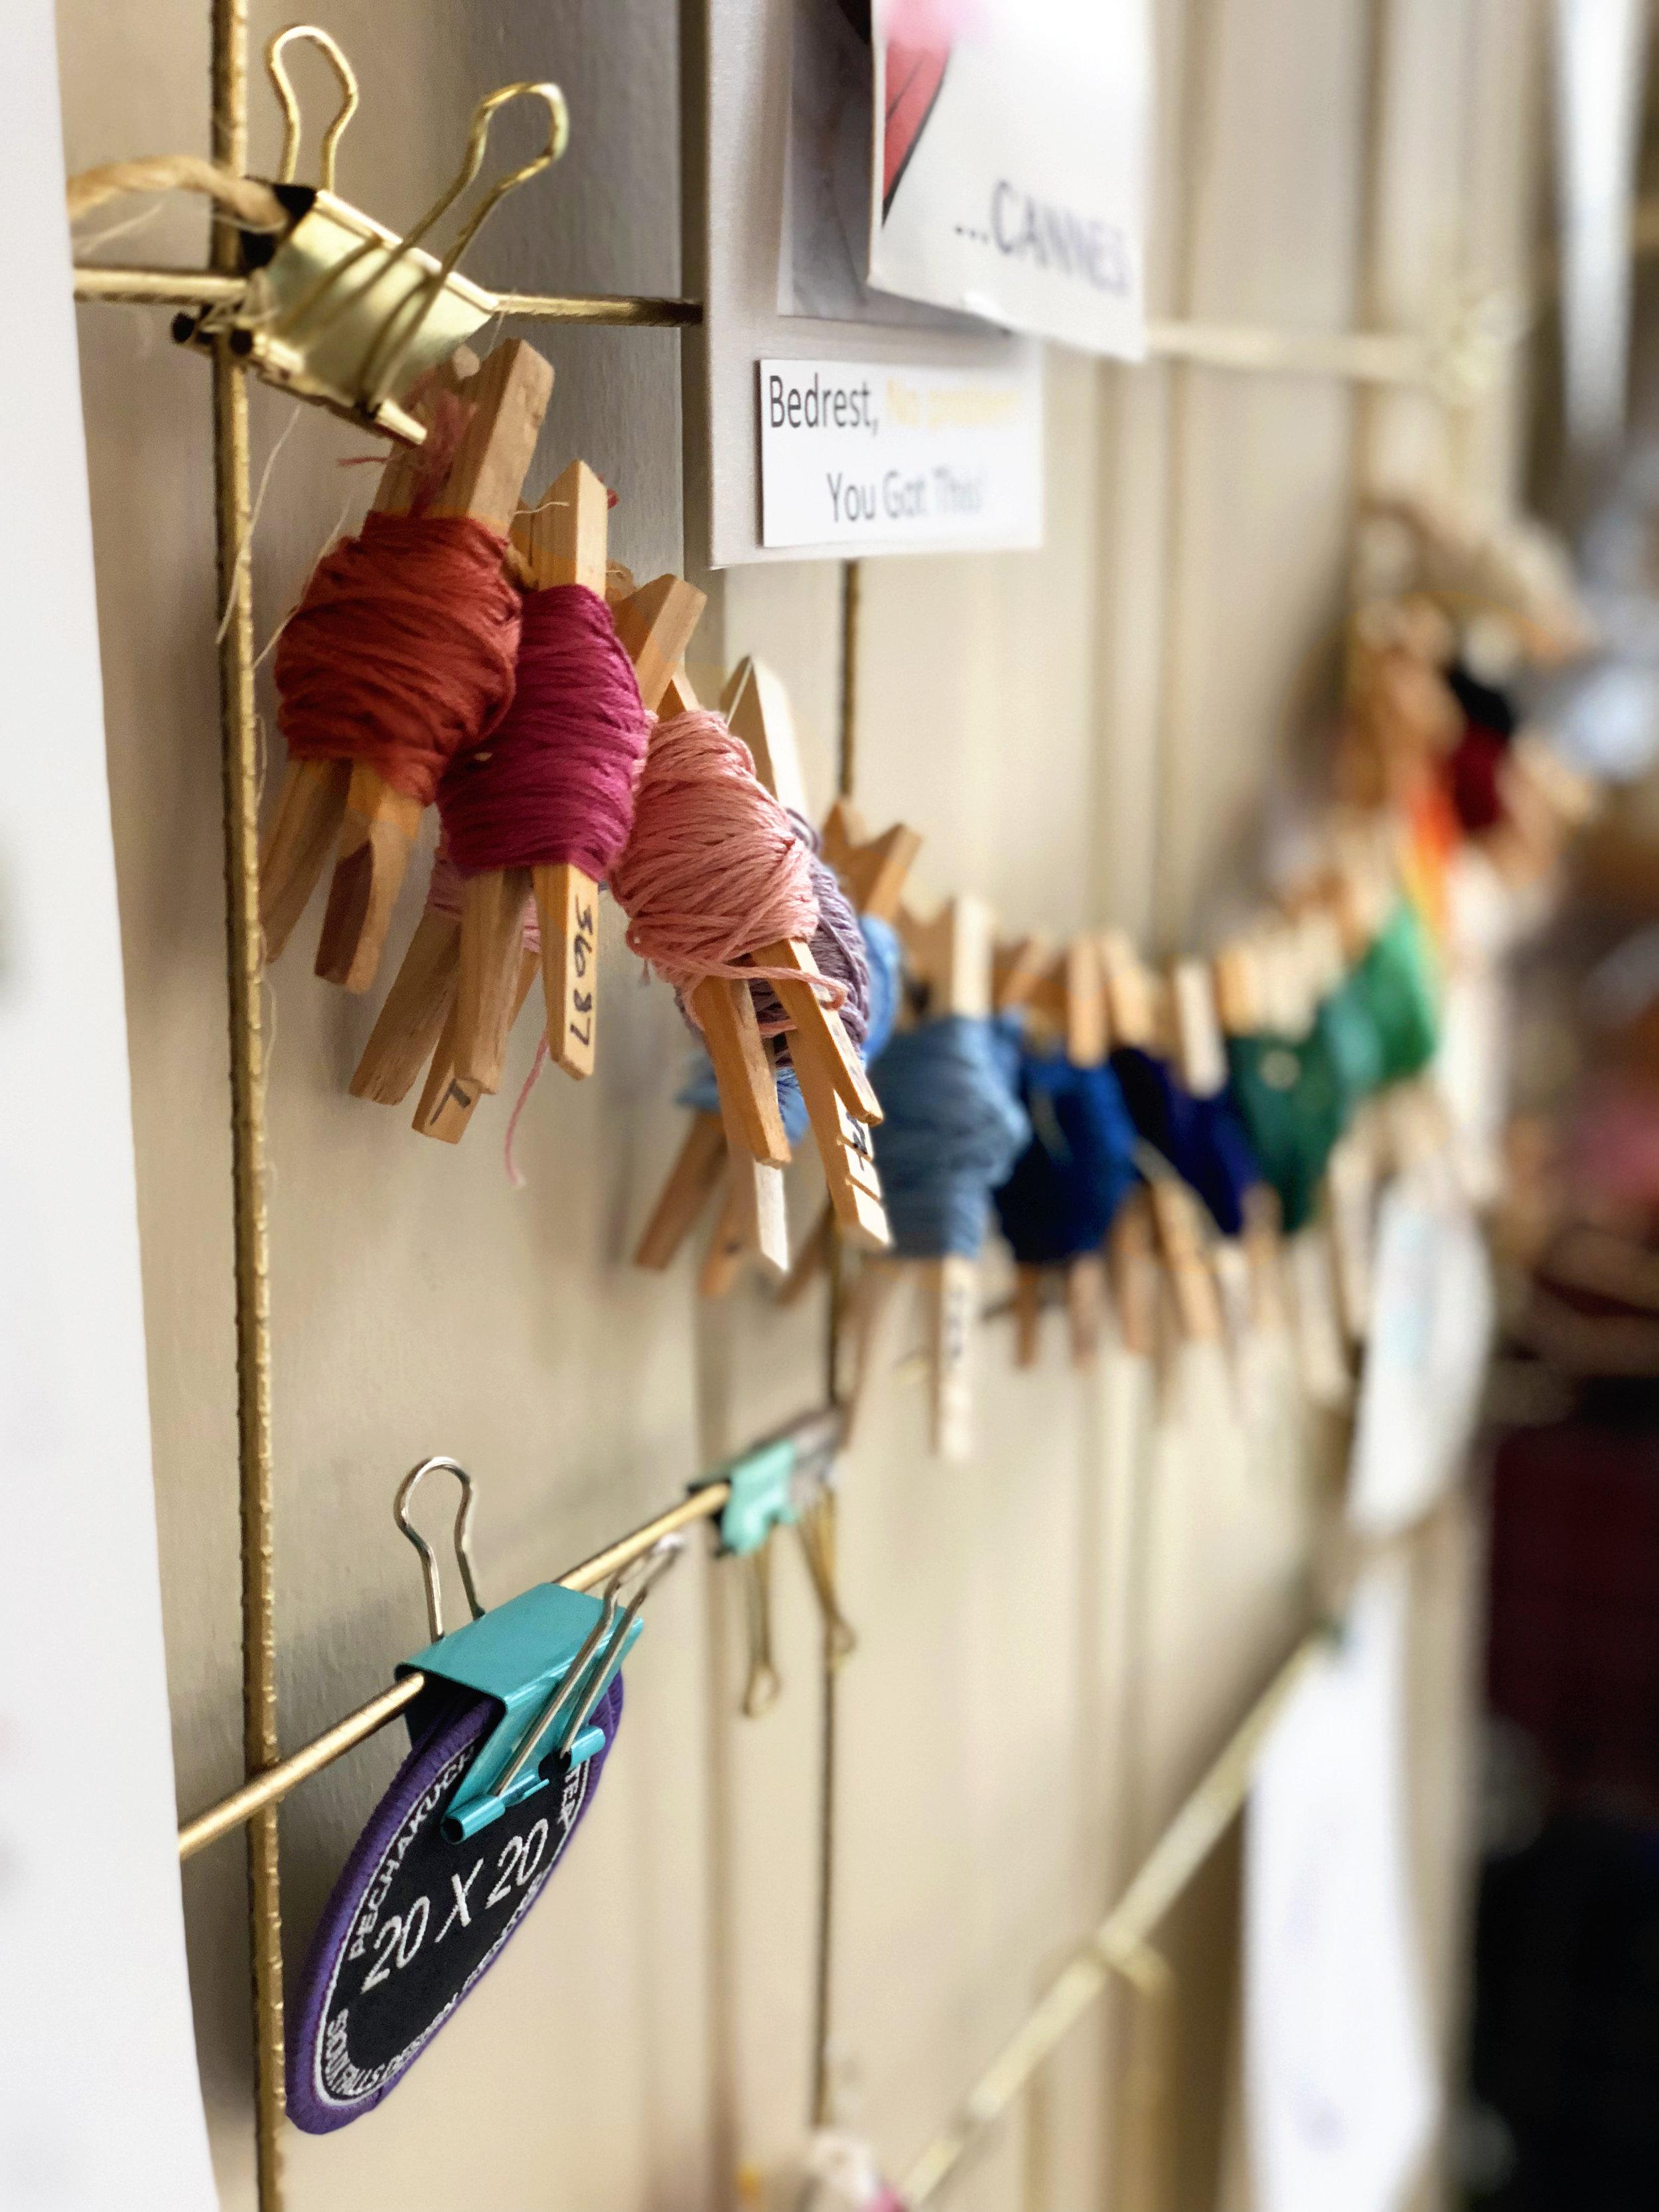 embroidery thread organized.jpg